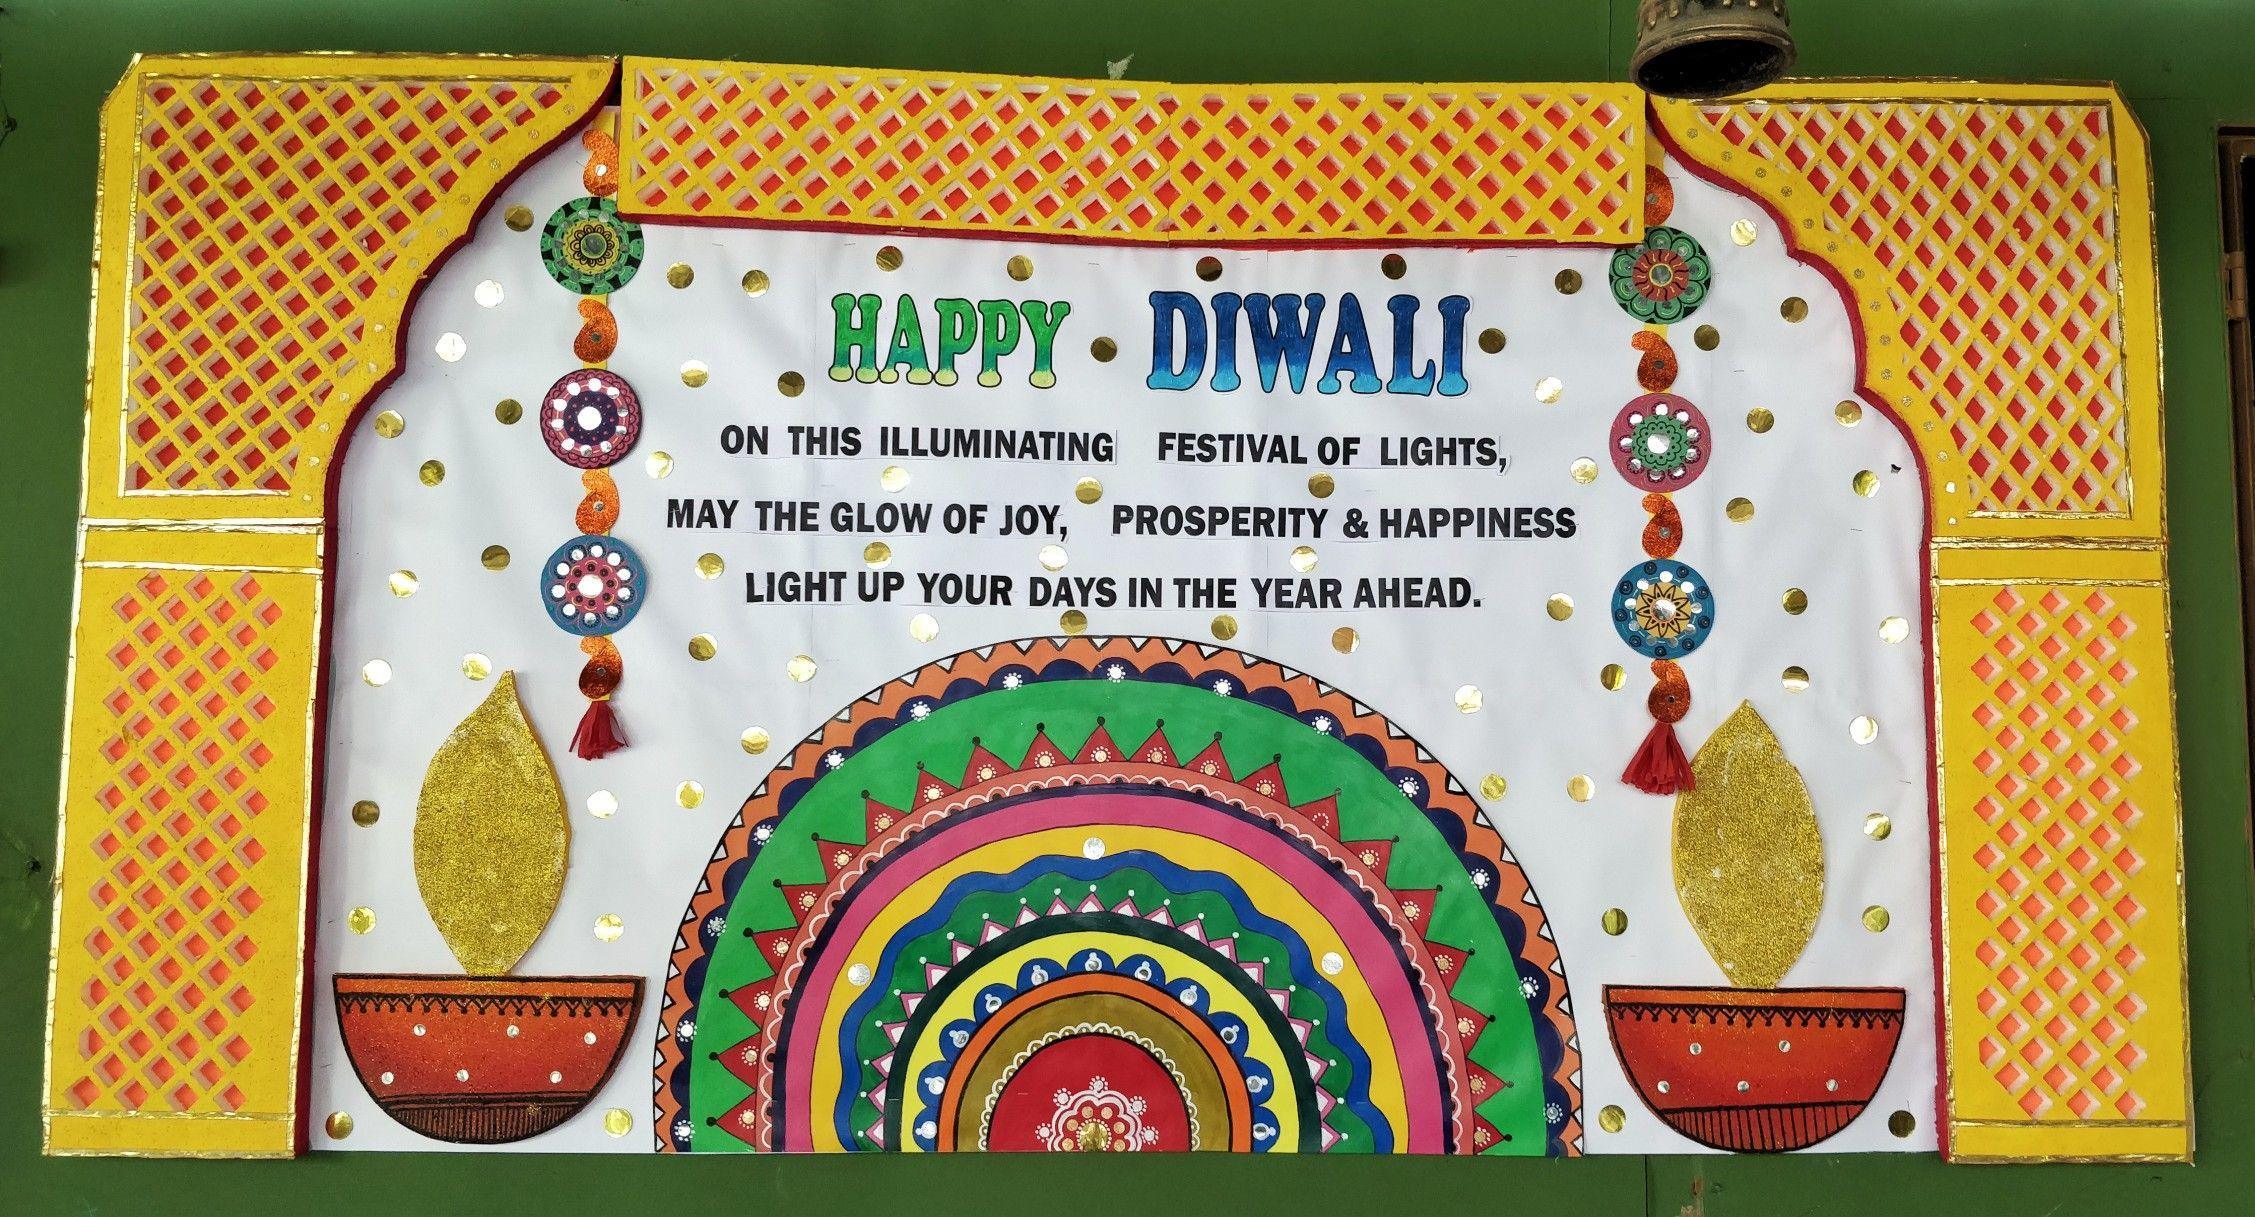 Diwali Bulletin Board Diwali Craft School Crafts Diwali Decorations [ 1217 x 2255 Pixel ]